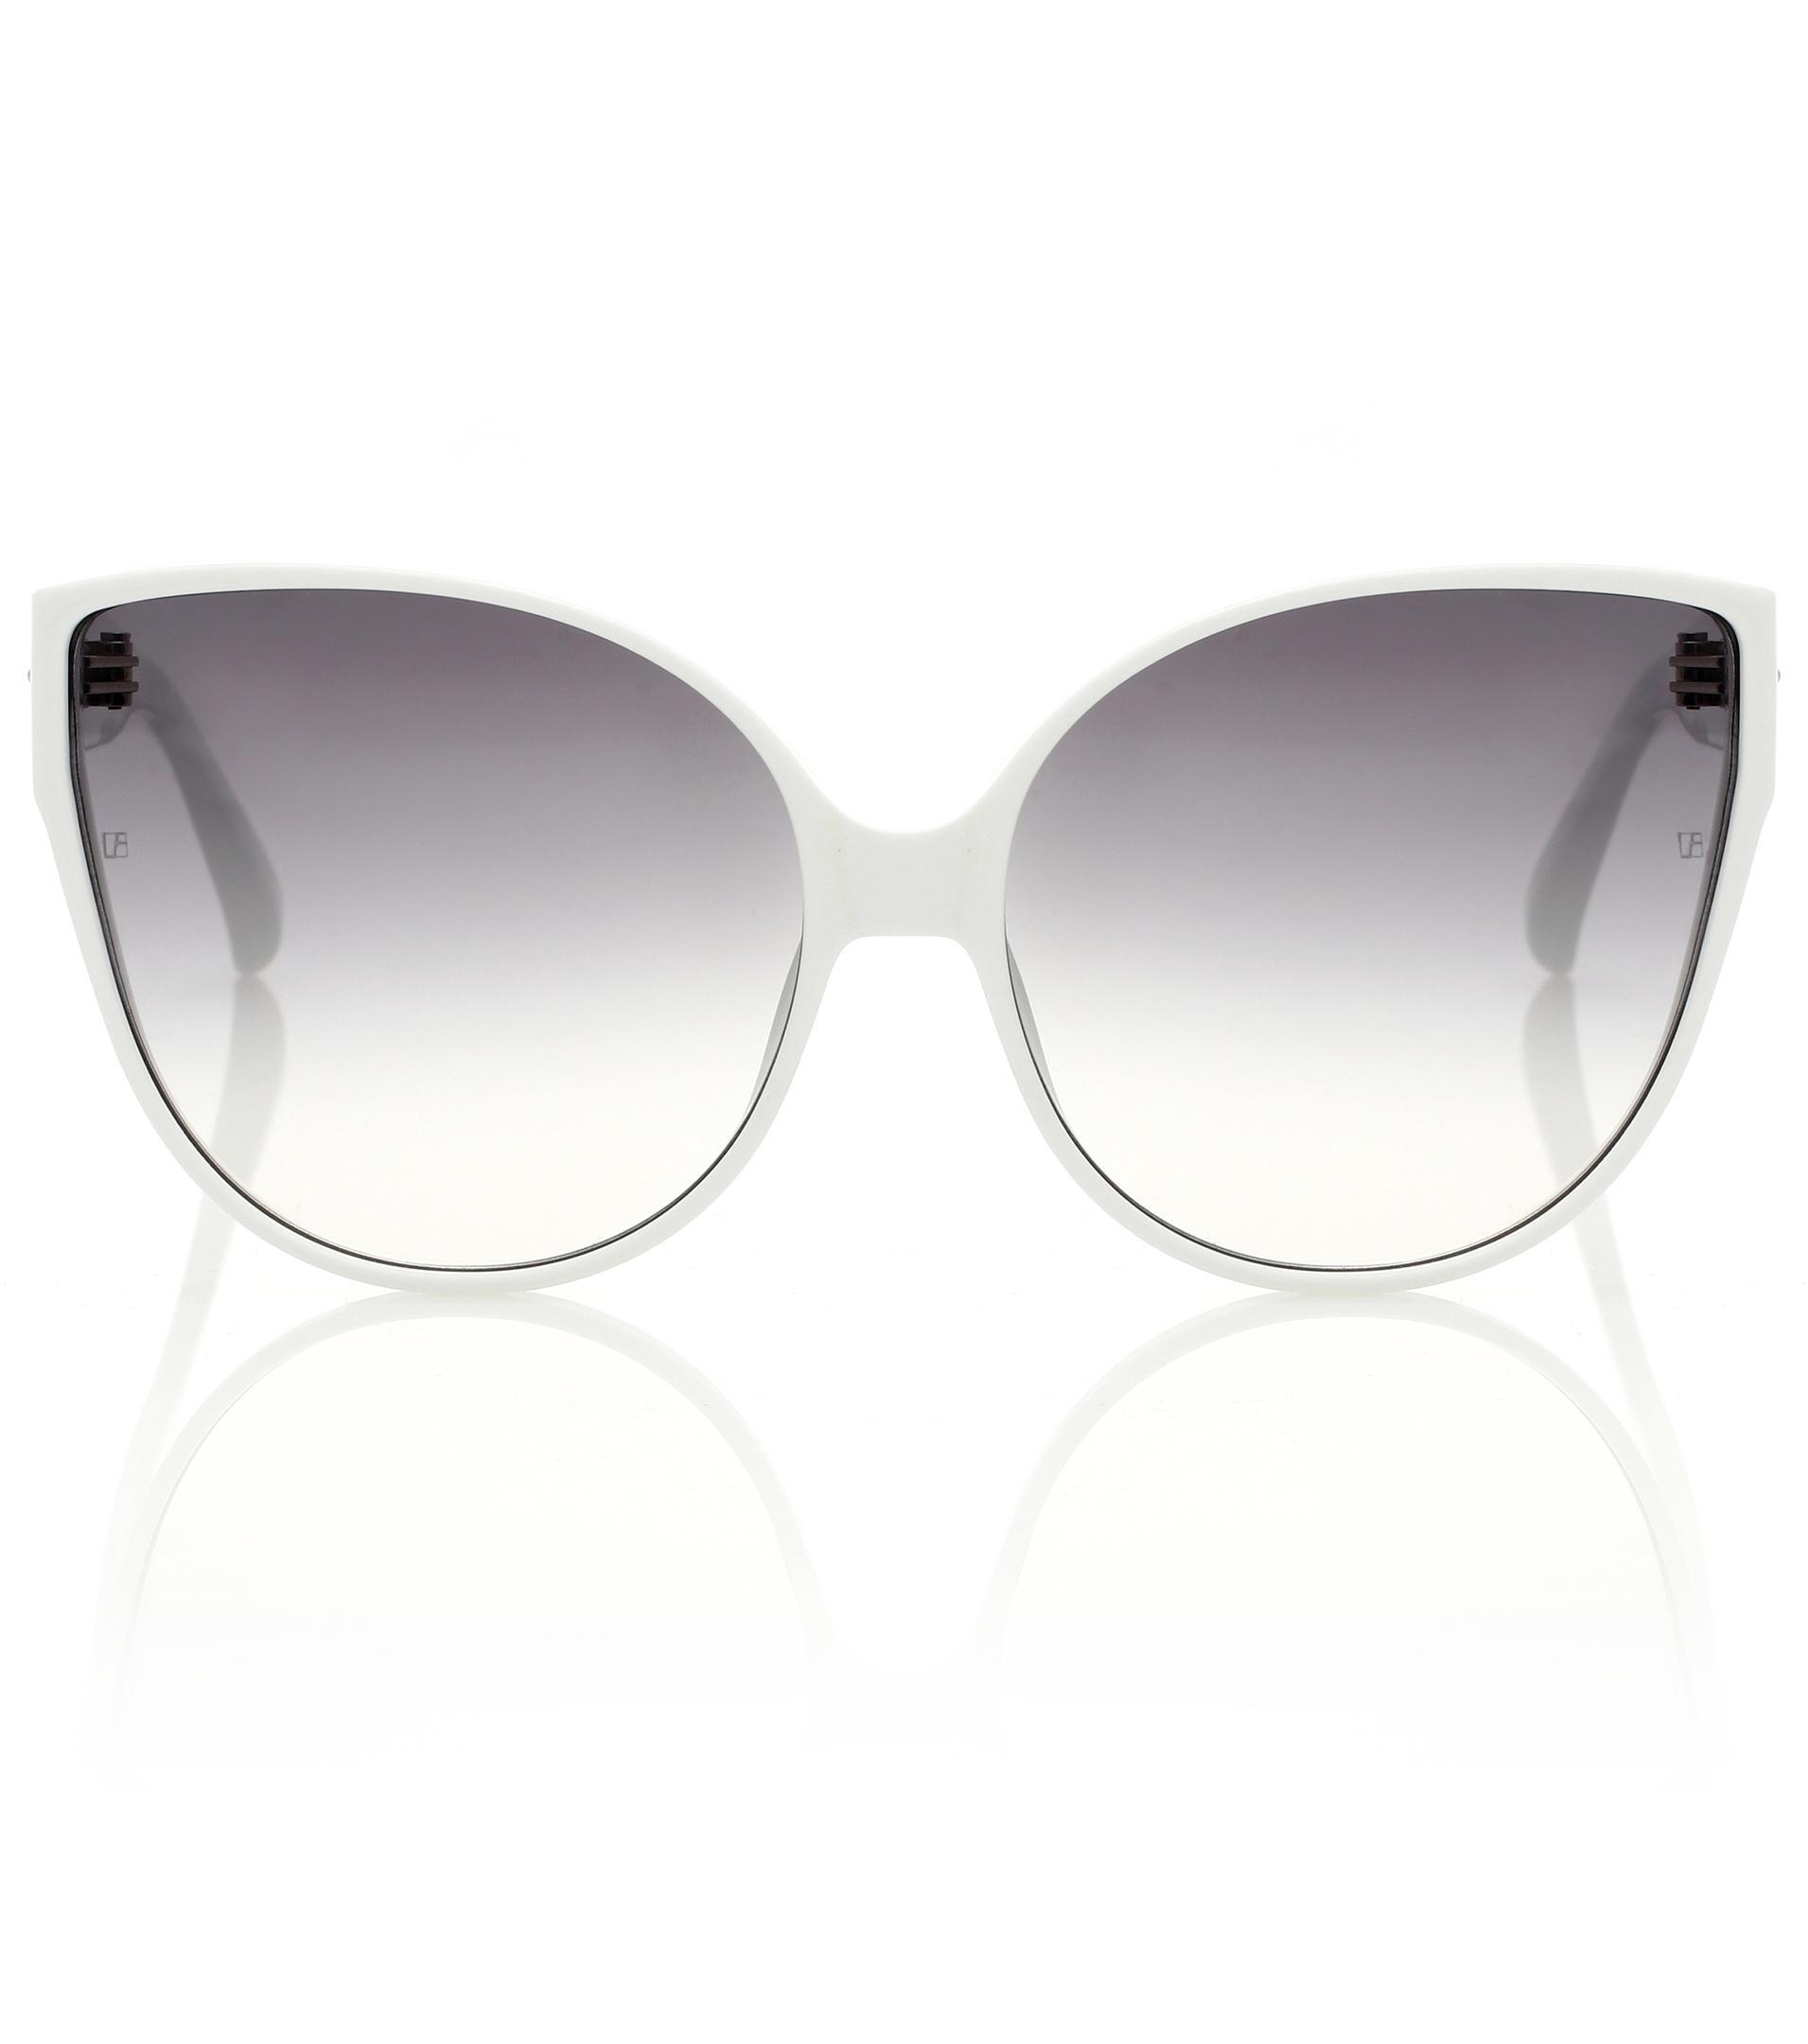 650c85aa9d5 Lyst - Linda Farrow 656 C12 Cat-eye Sunglasses in White